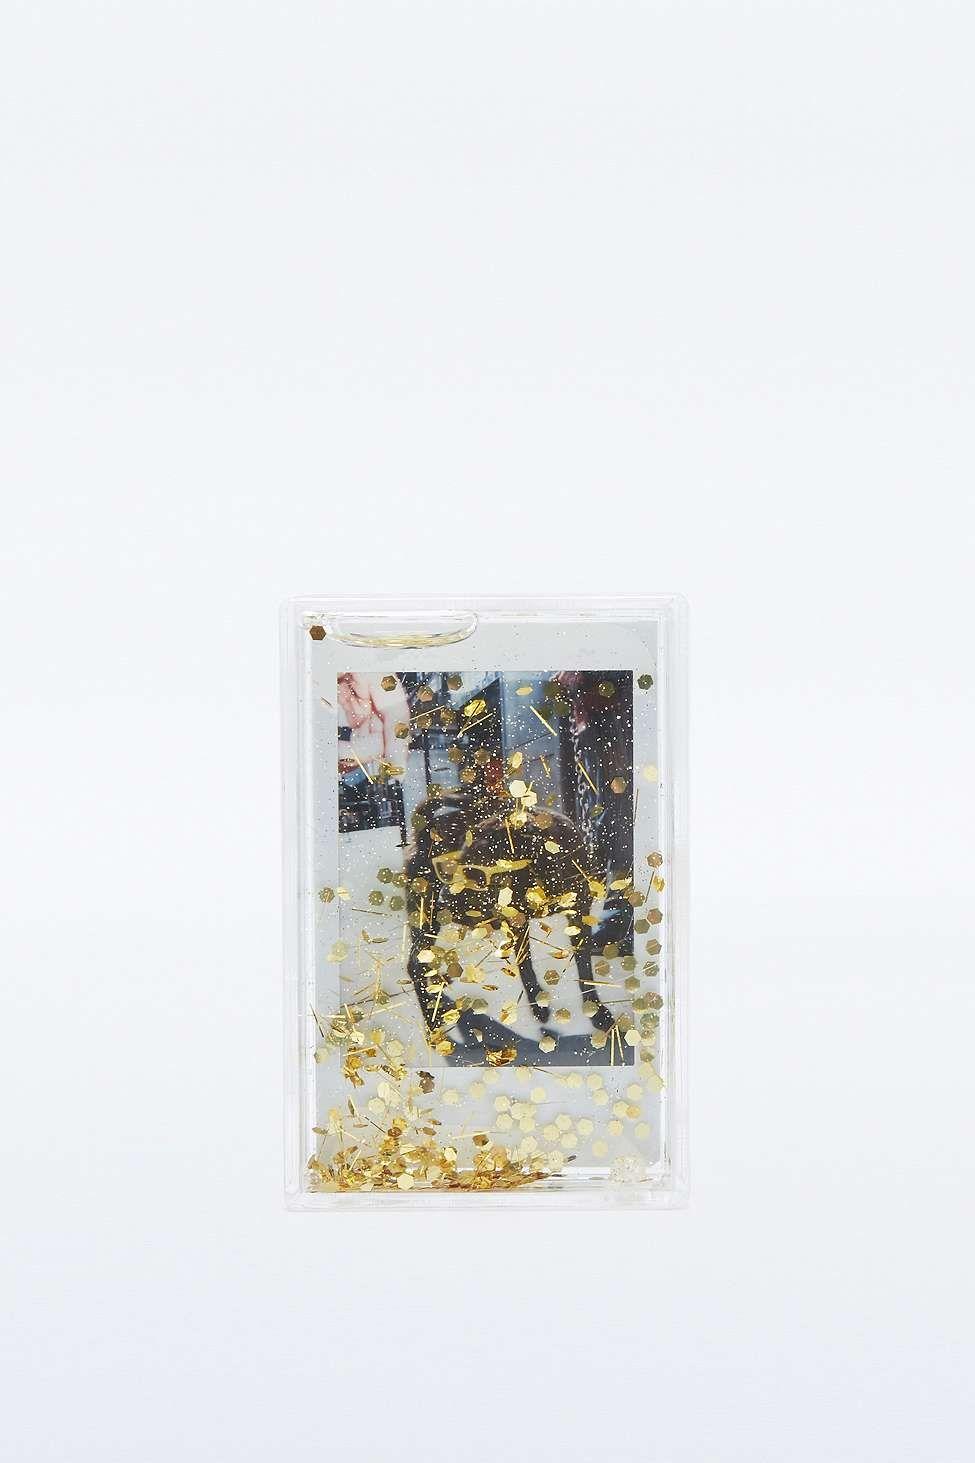 Fein Abgeschrägte Glas Fotorahmen Ideen - Rahmen Ideen ...